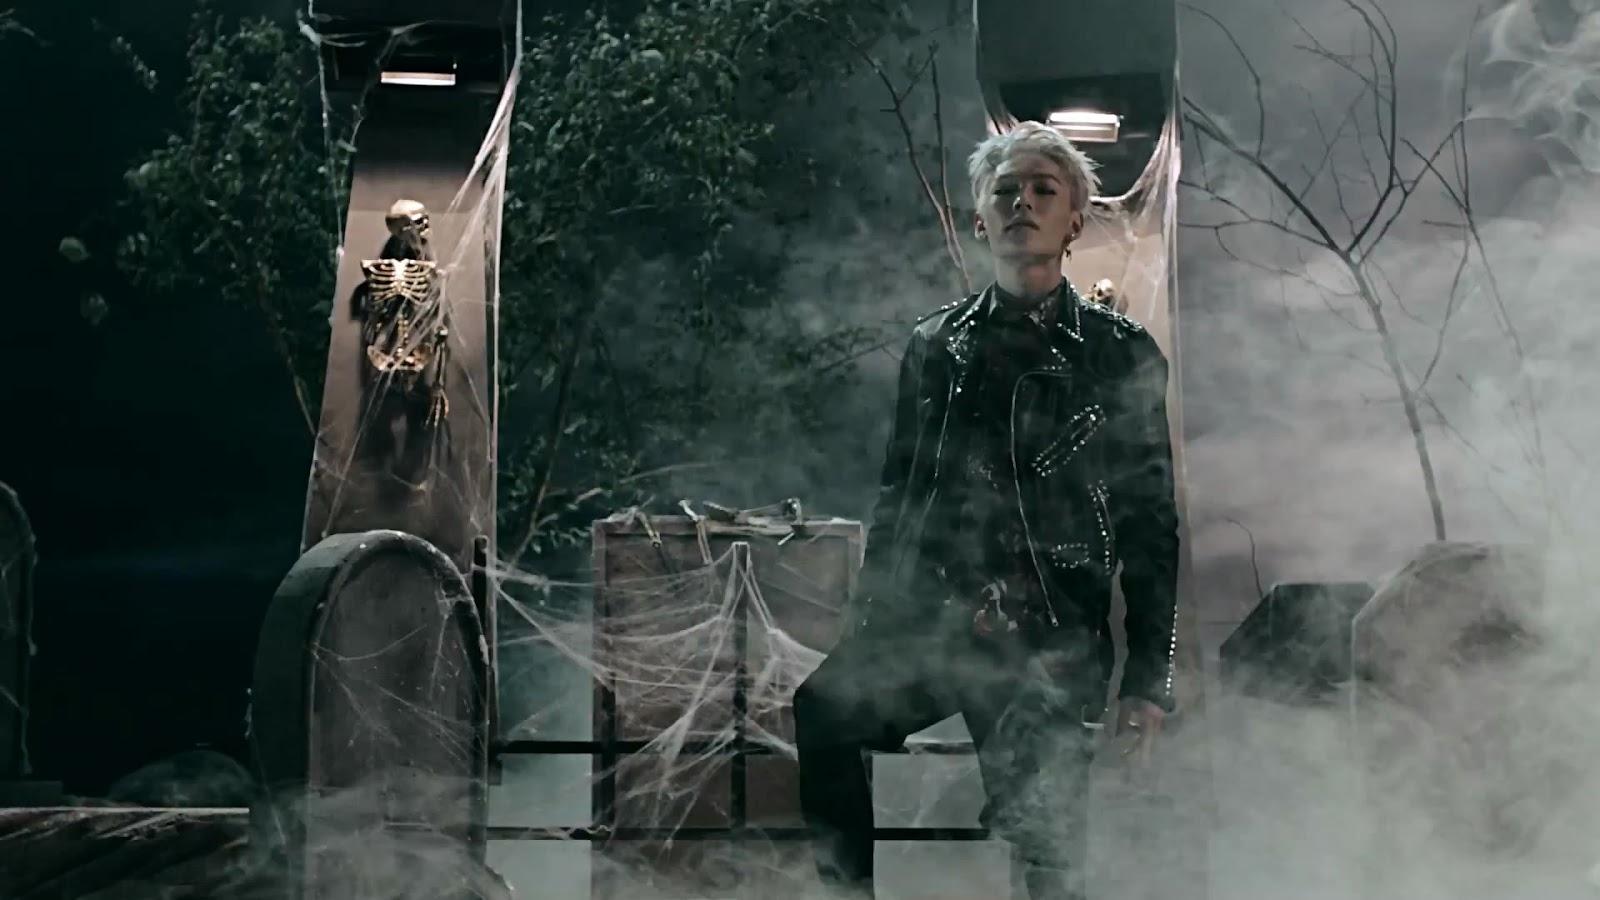 BtoB - Thriller MV και who-is-who (ένα από τα καλύτερα ...